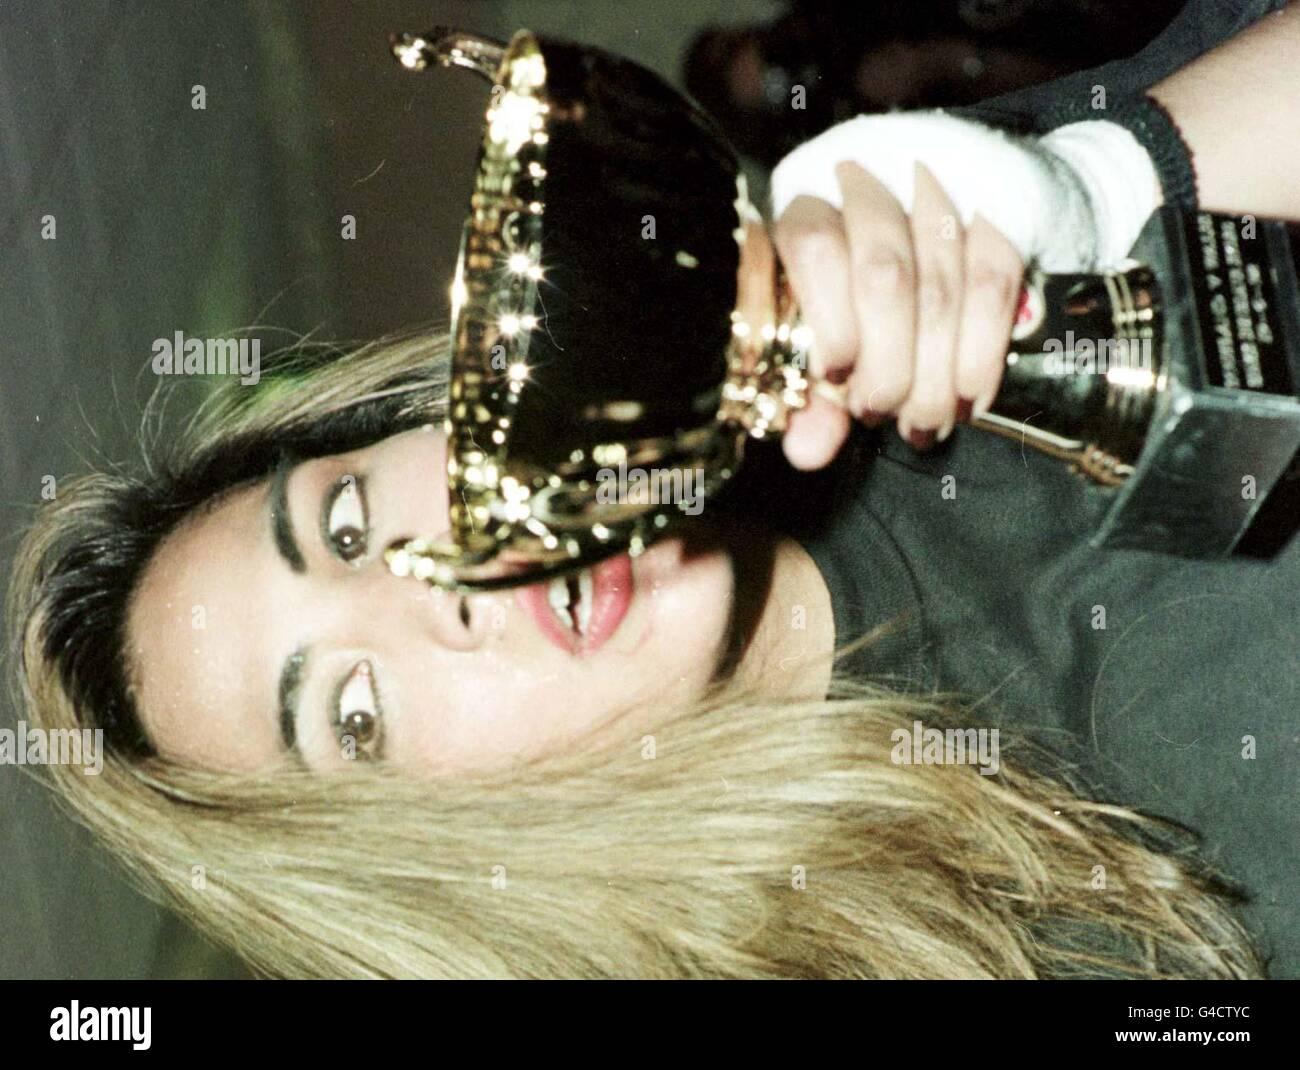 Boxeo Femenino ganador 2 Imagen De Stock